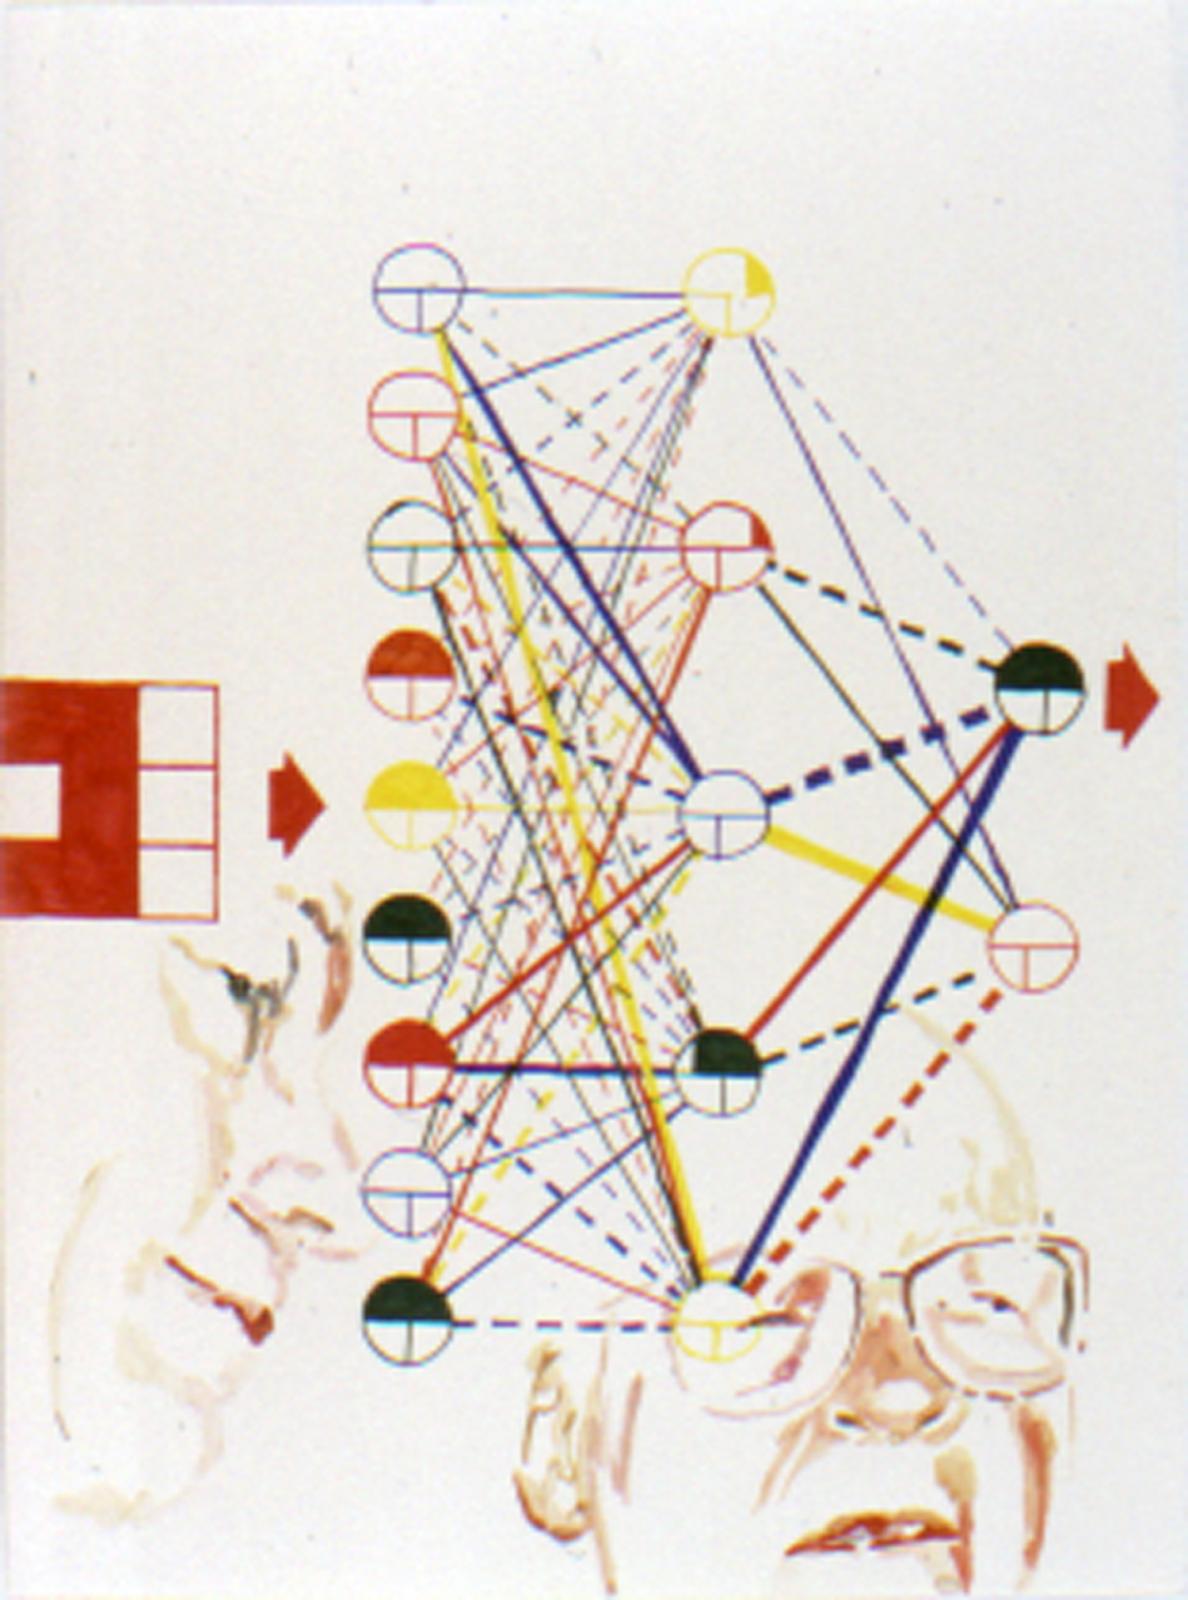 TONY OURSLER, Gibbons/Conrad Effect, 2001